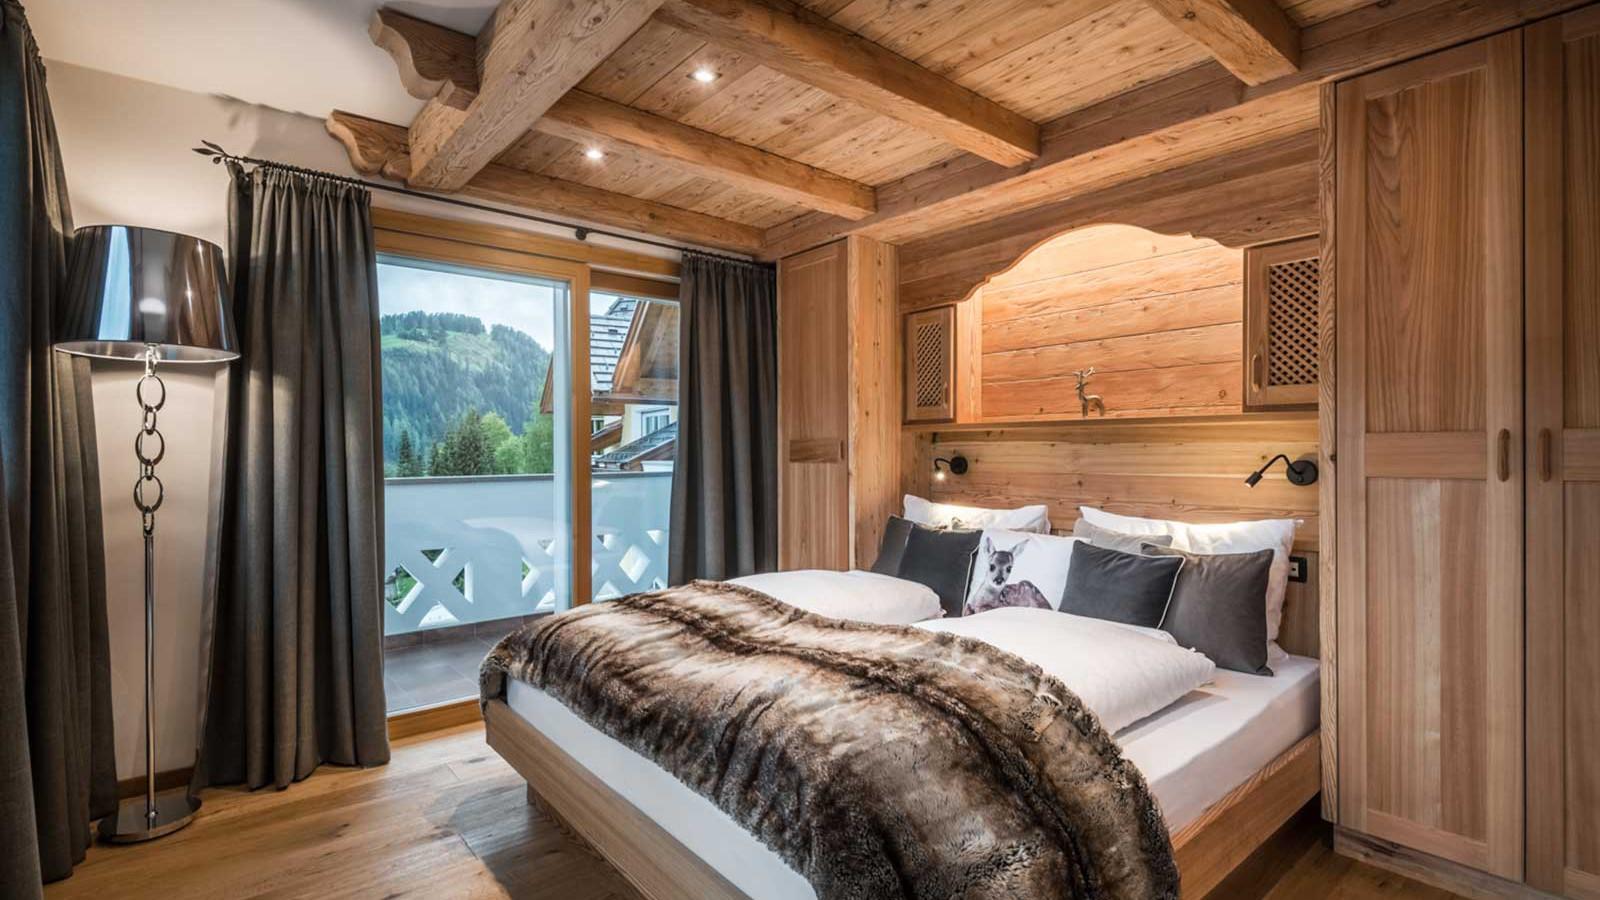 Alpenhotel Plaza - Rooms